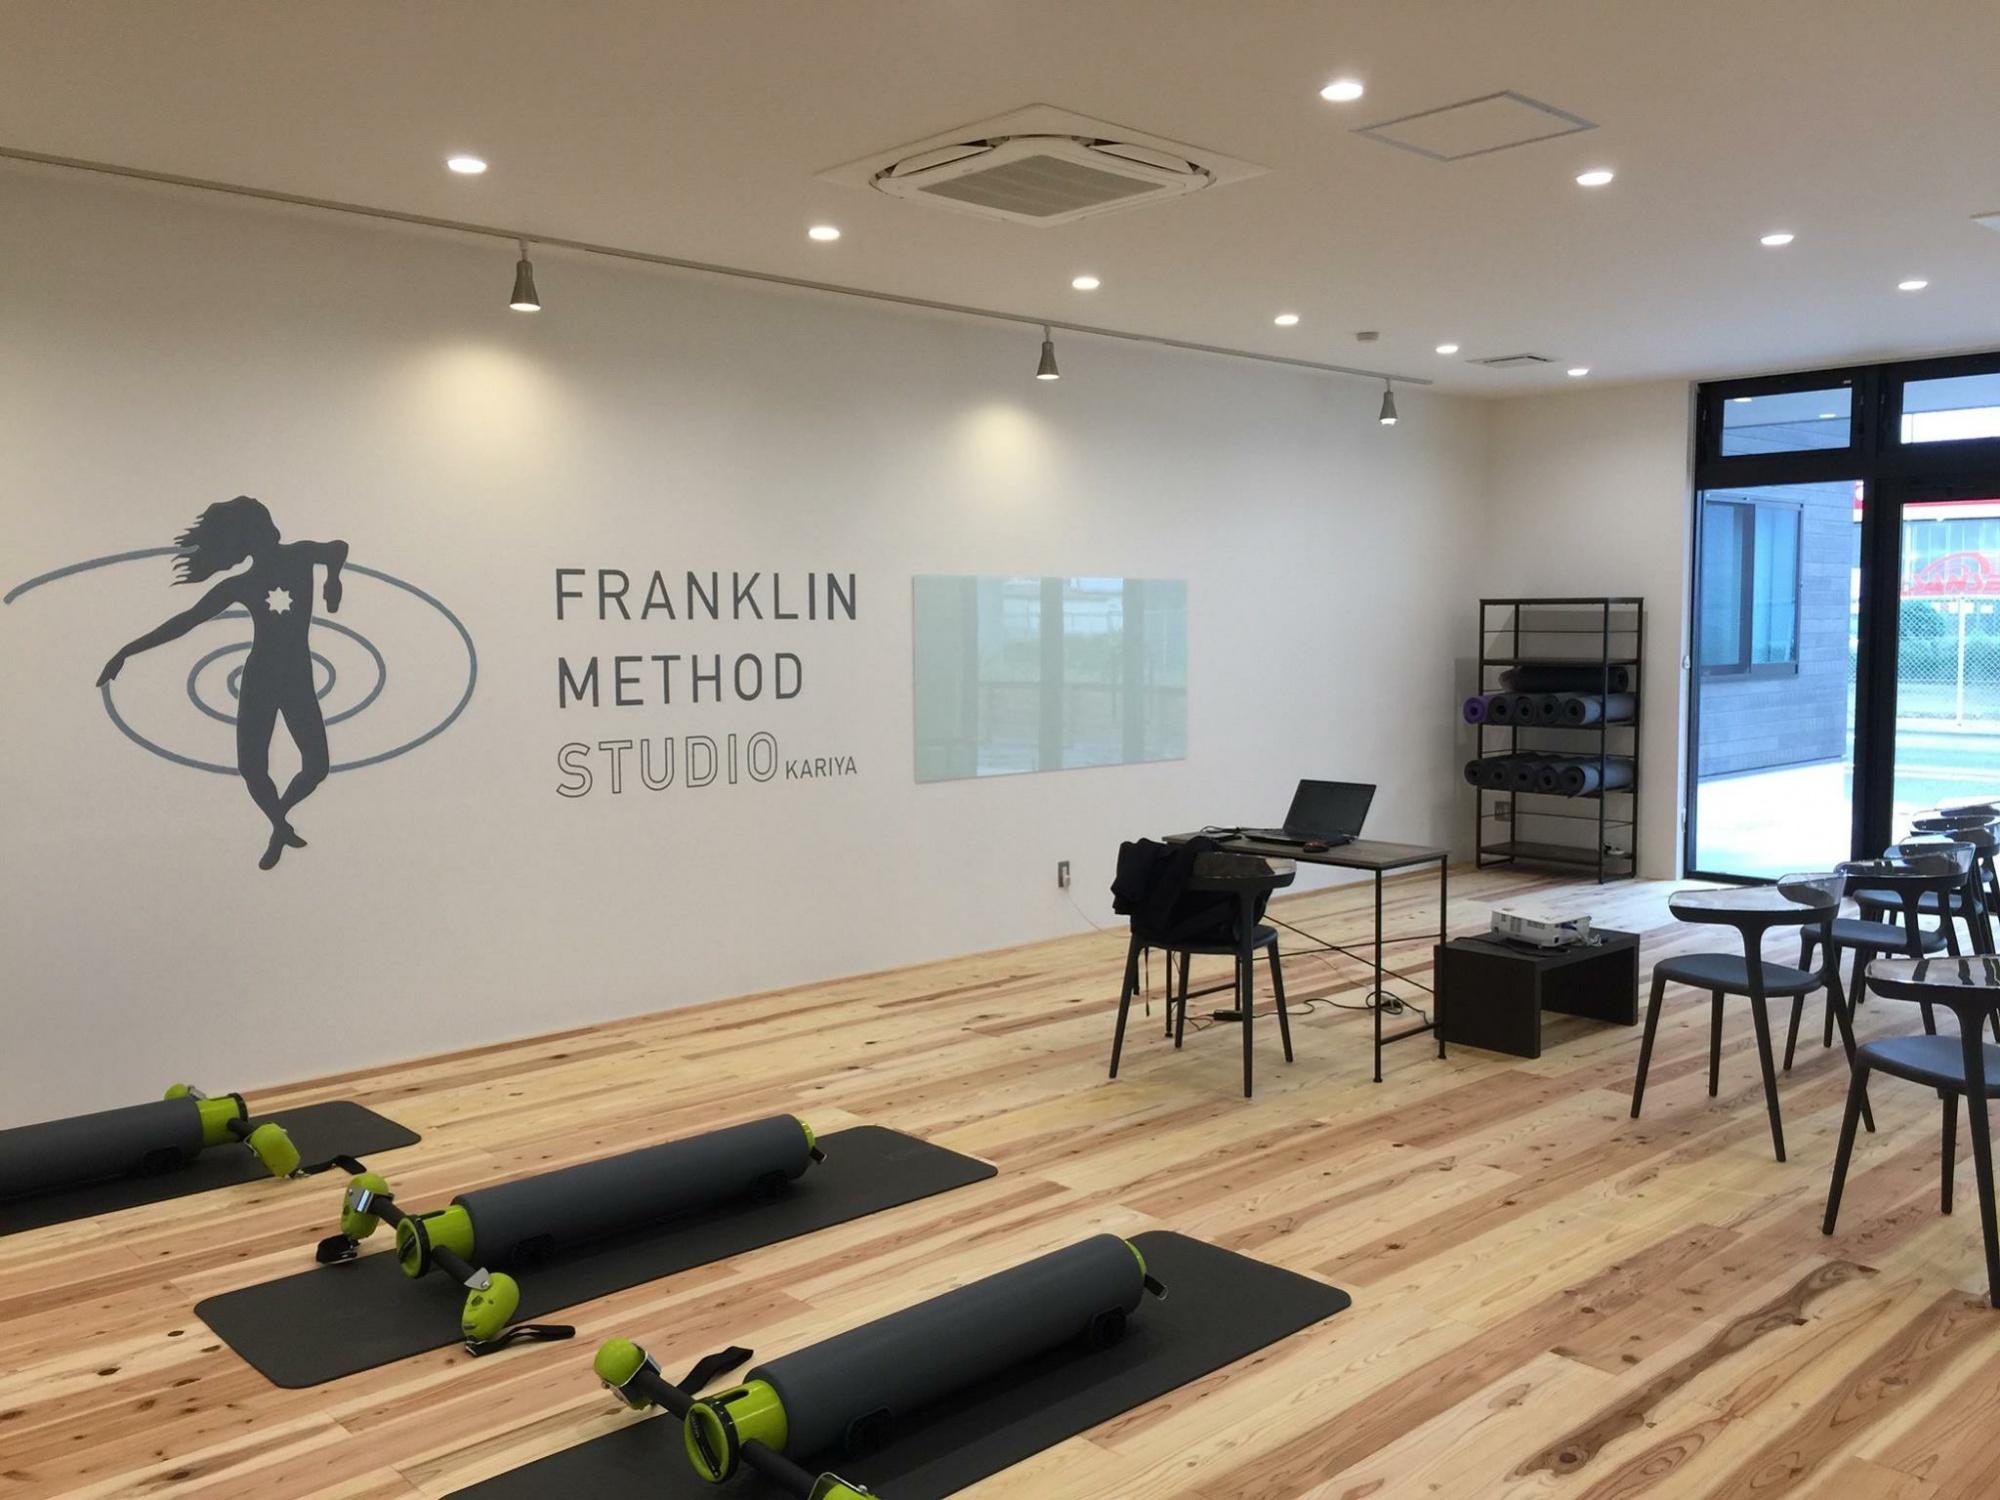 「FRANKLIN METHOD STUDIO KARIYA」が刈谷市にOPEN!